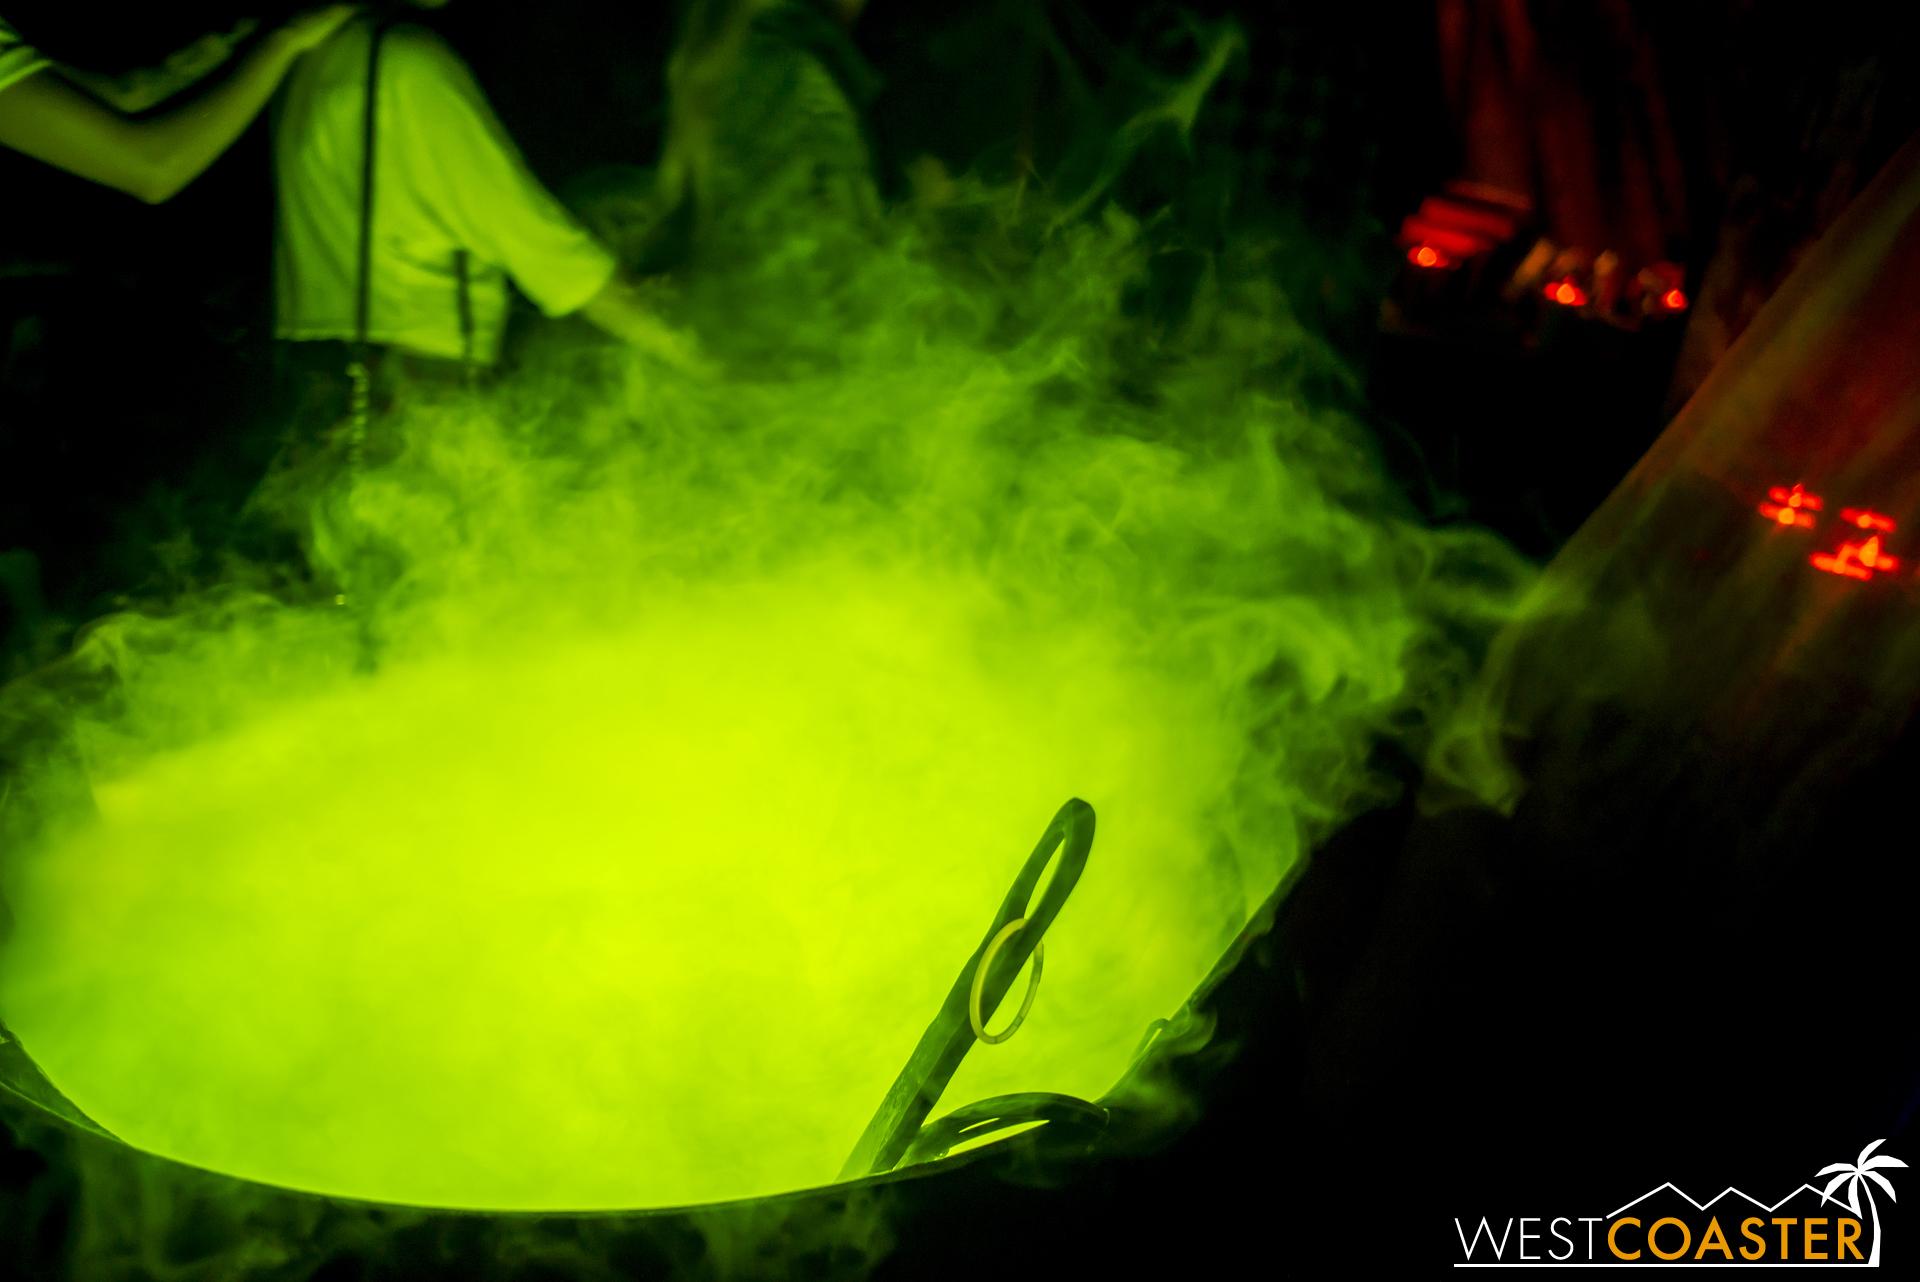 A bubbling cauldron awaits next door.